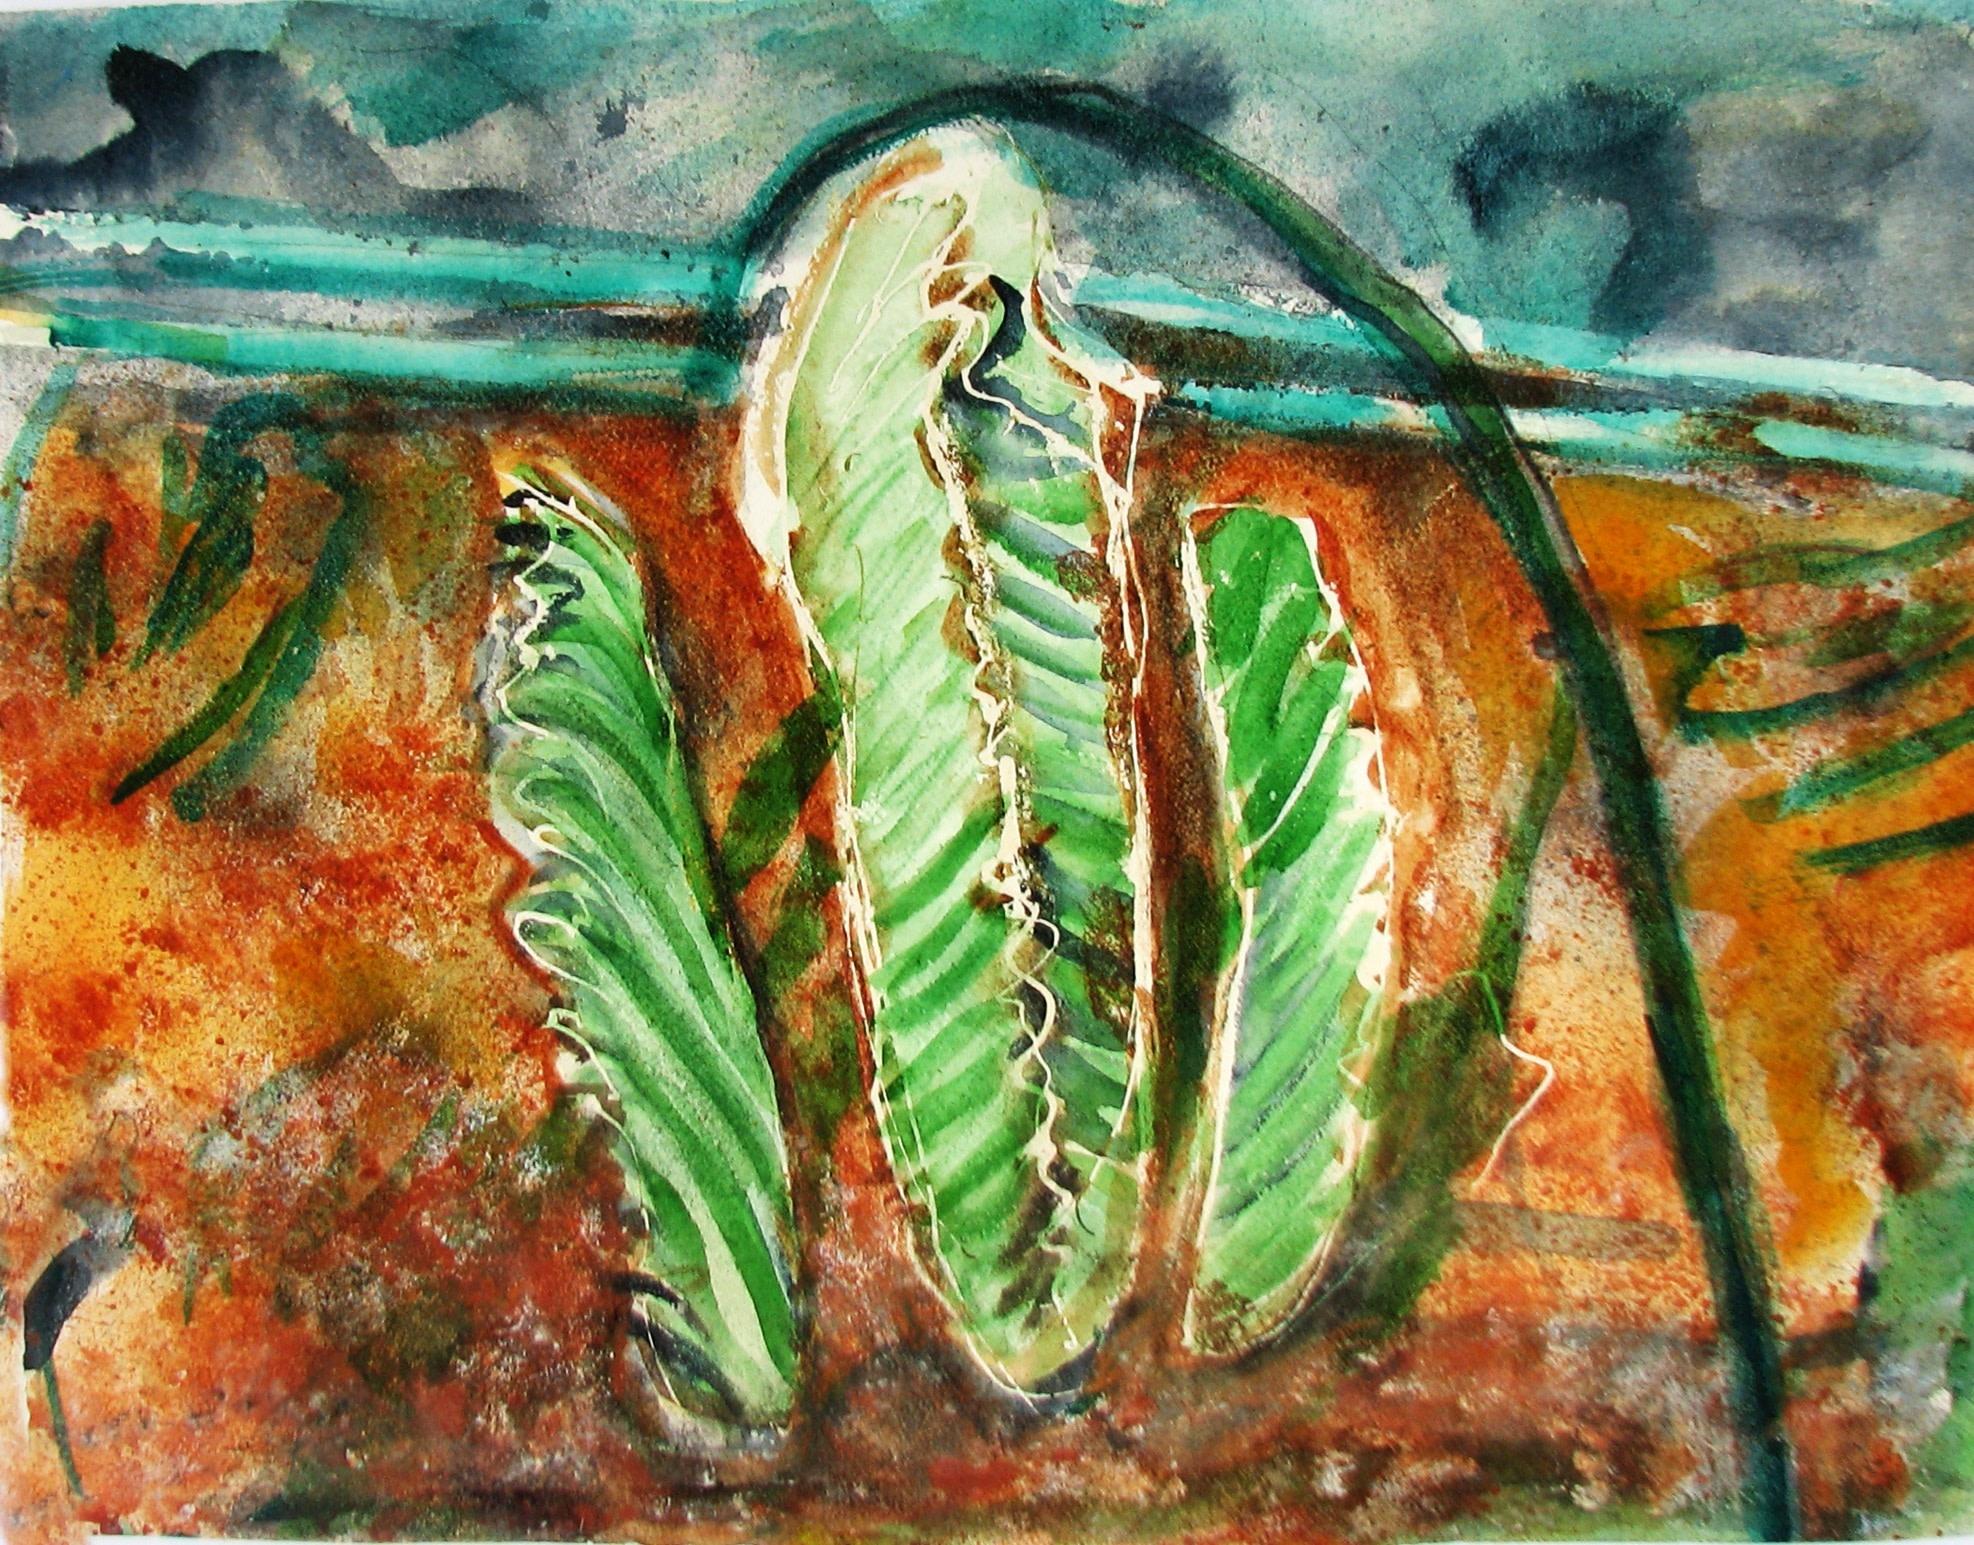 <span class=&#34;link fancybox-details-link&#34;><a href=&#34;/exhibitions/24/works/artworks_standalone10799/&#34;>View Detail Page</a></span><div class=&#34;artist&#34;><span class=&#34;artist&#34;><strong>Agathe Sorel</strong></span></div><div class=&#34;title&#34;><em>Cactus and Hosepipe</em></div><div class=&#34;medium&#34;>watercolour & collage</div><div class=&#34;dimensions&#34;>39x50cm</div>